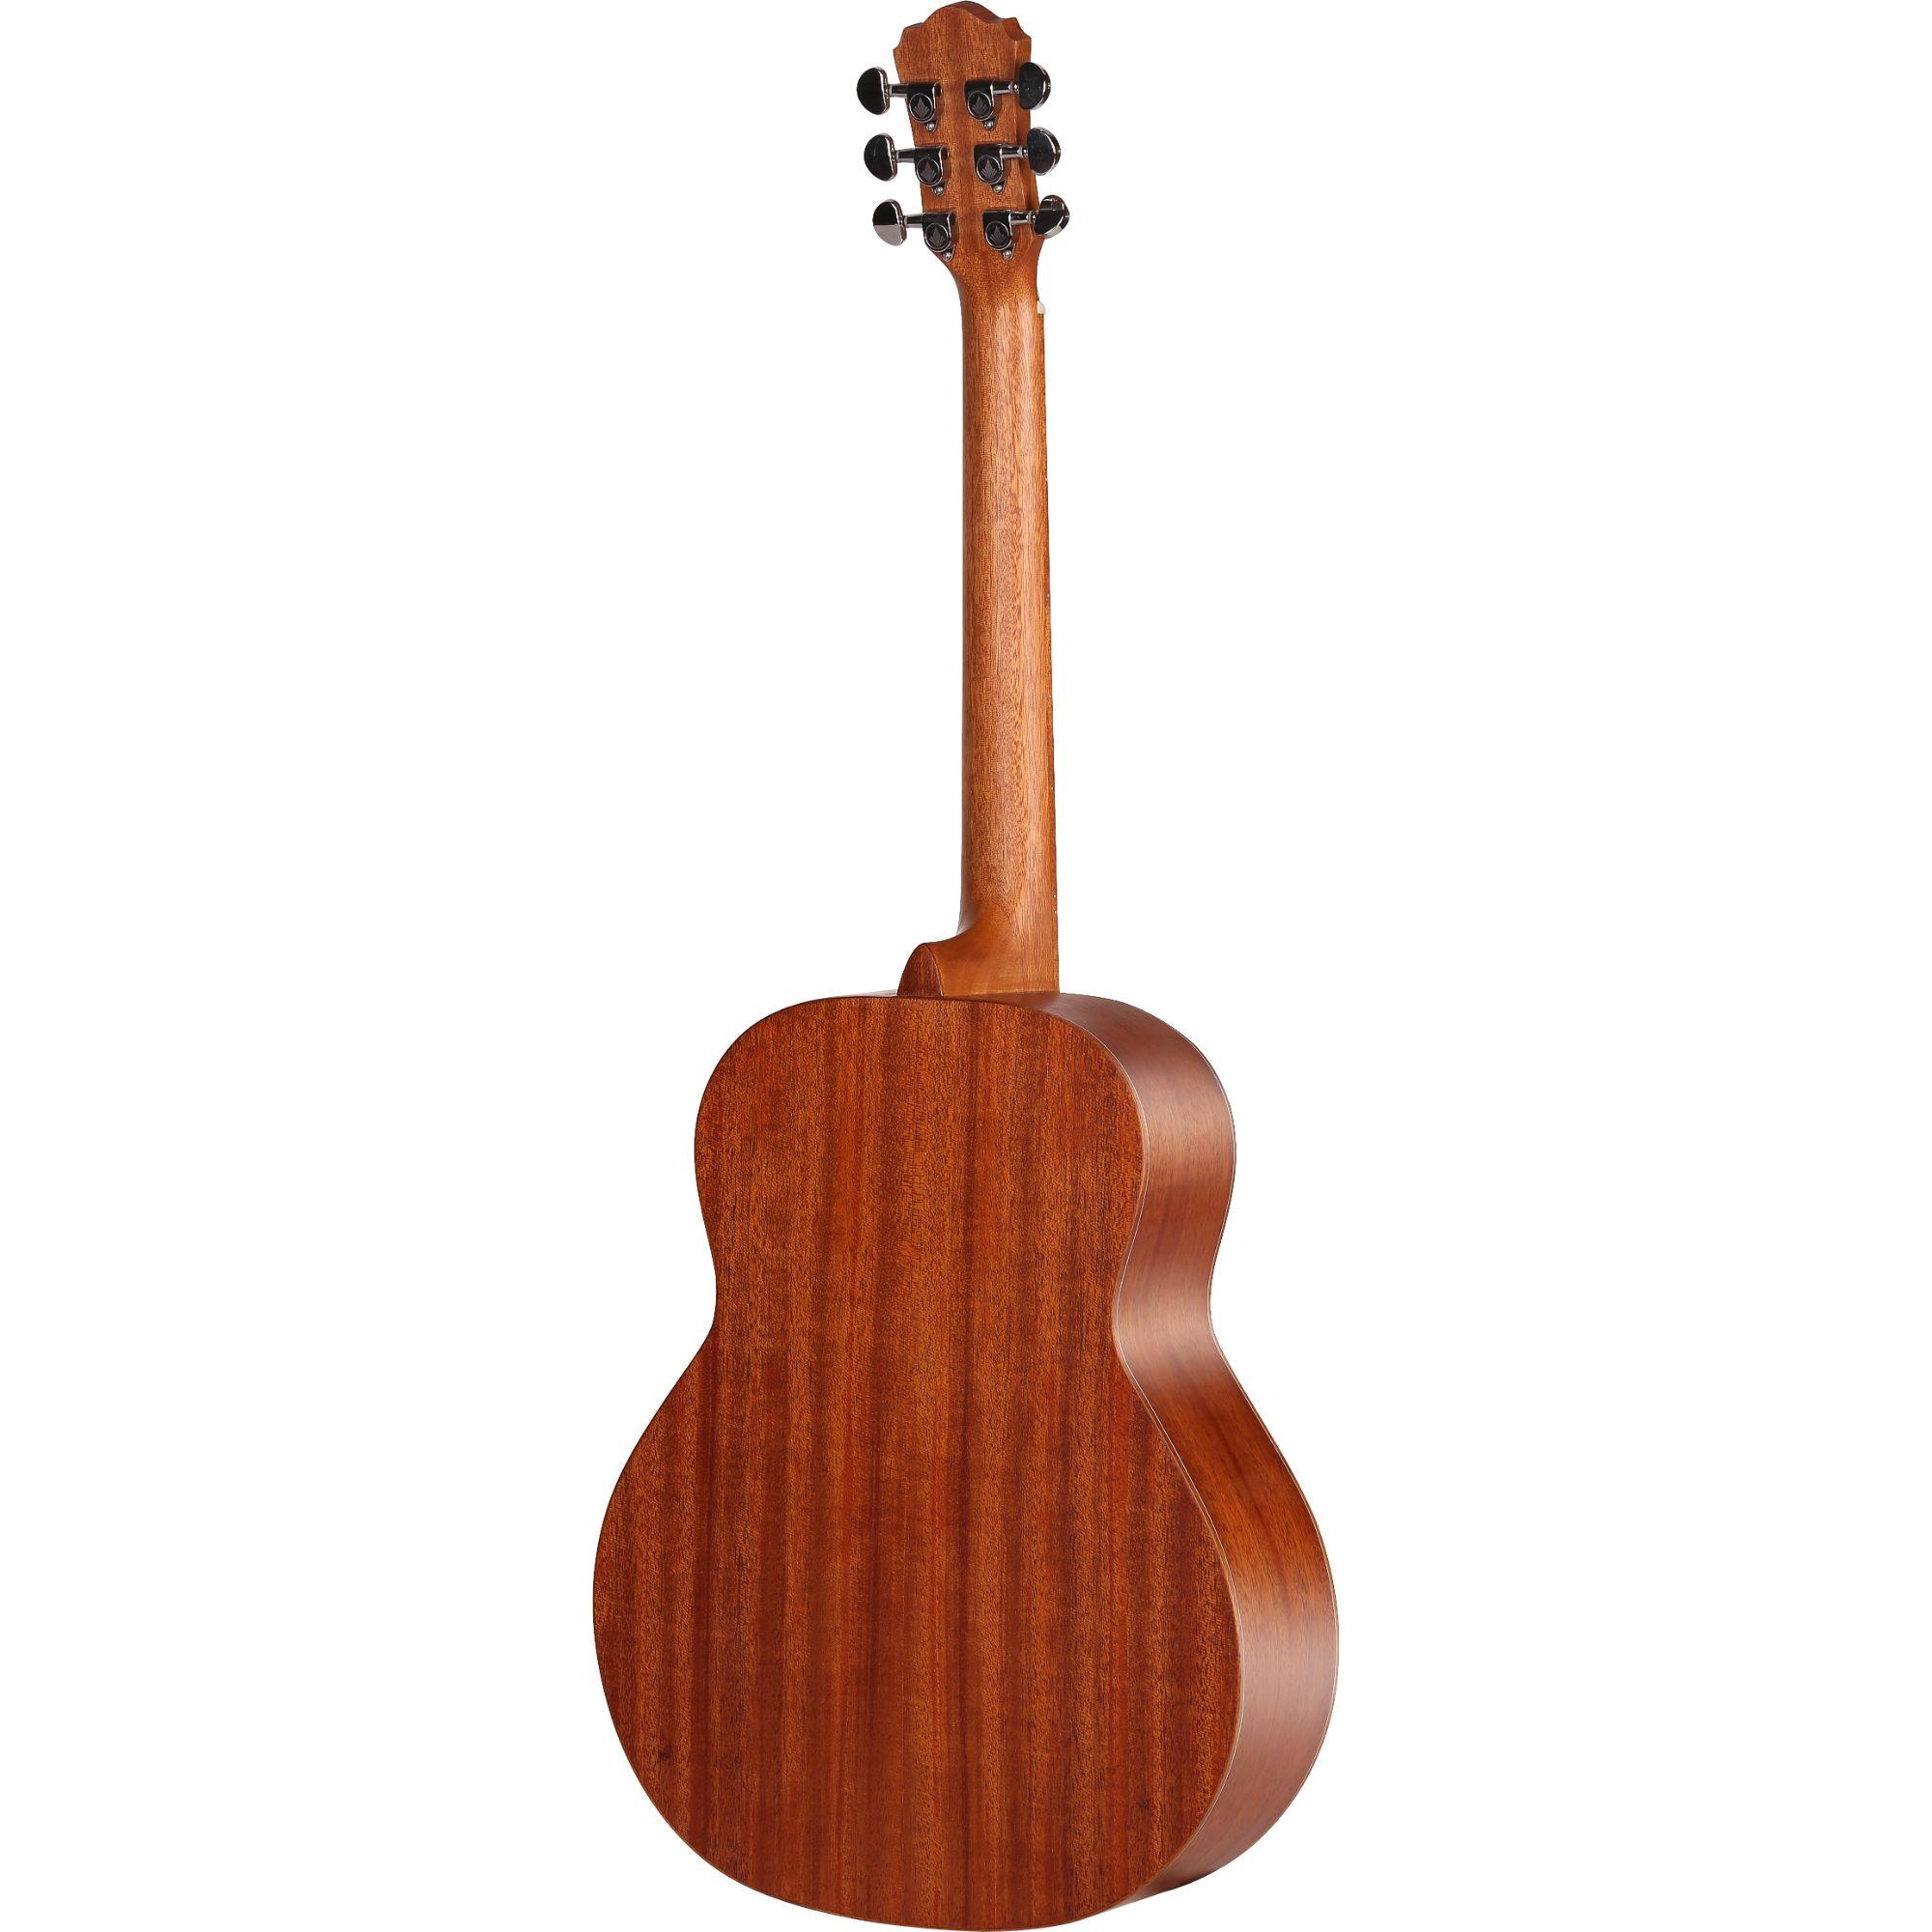 Mantic BG2  Travel Acoustic Guitar -Mahogany finish